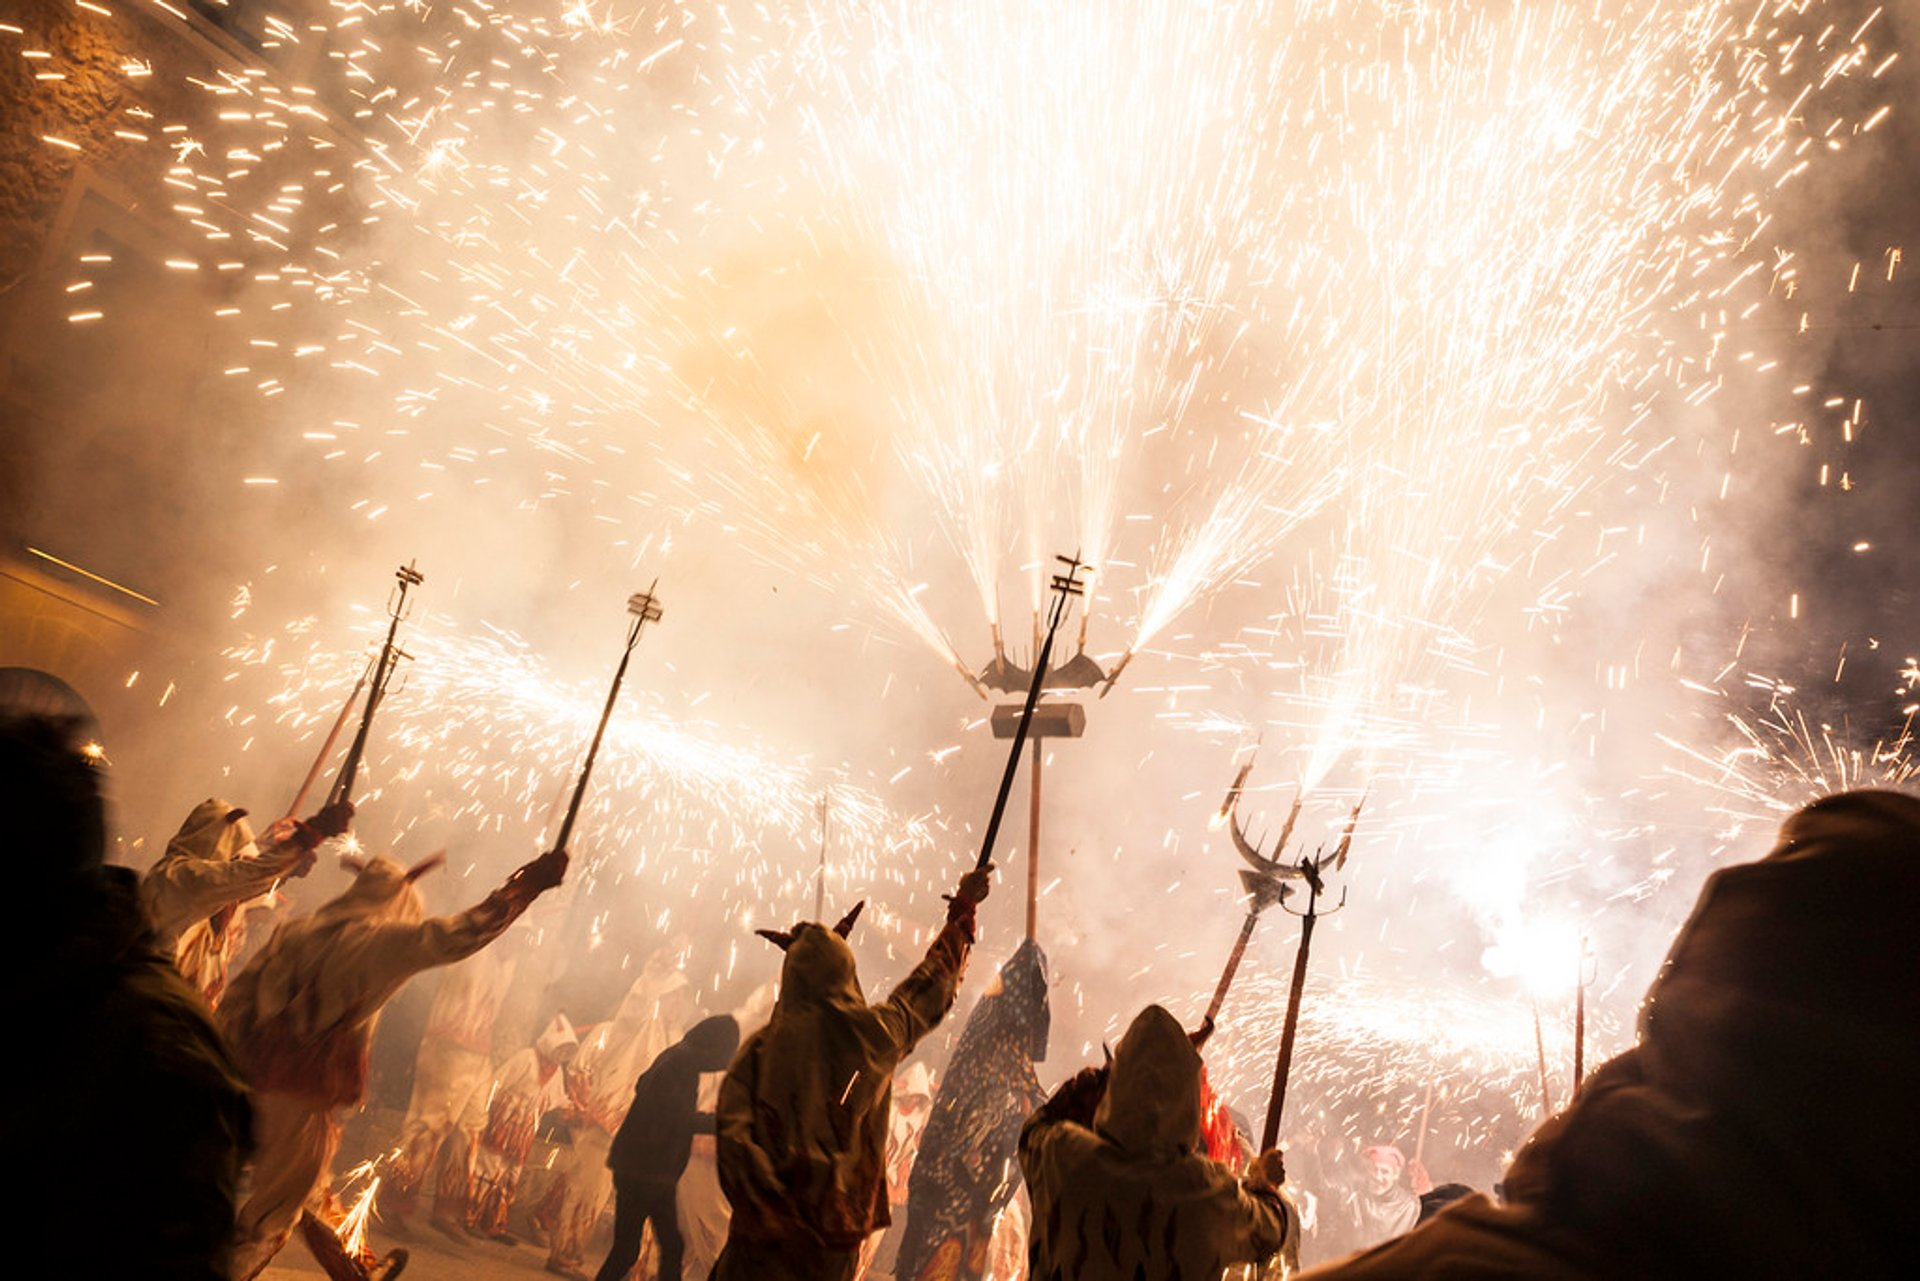 Saint Anthony's Day in Mallorca - Best Season 2020